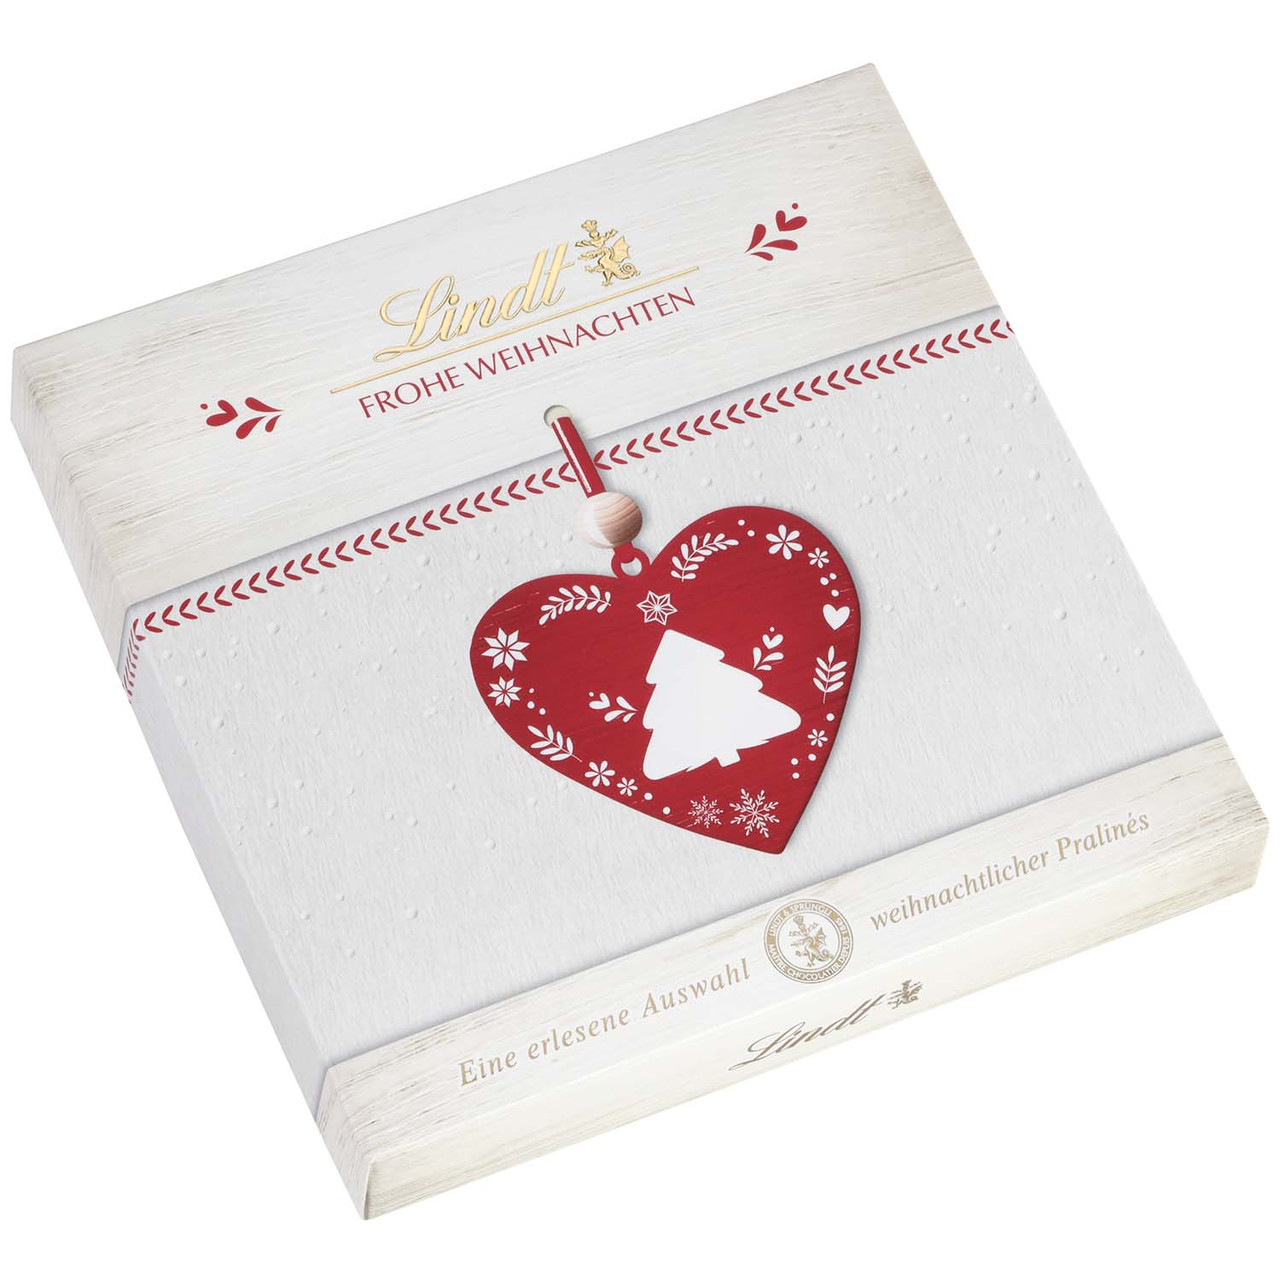 Hождественские конфеты Lindt Frohe Weihnachten 96 g